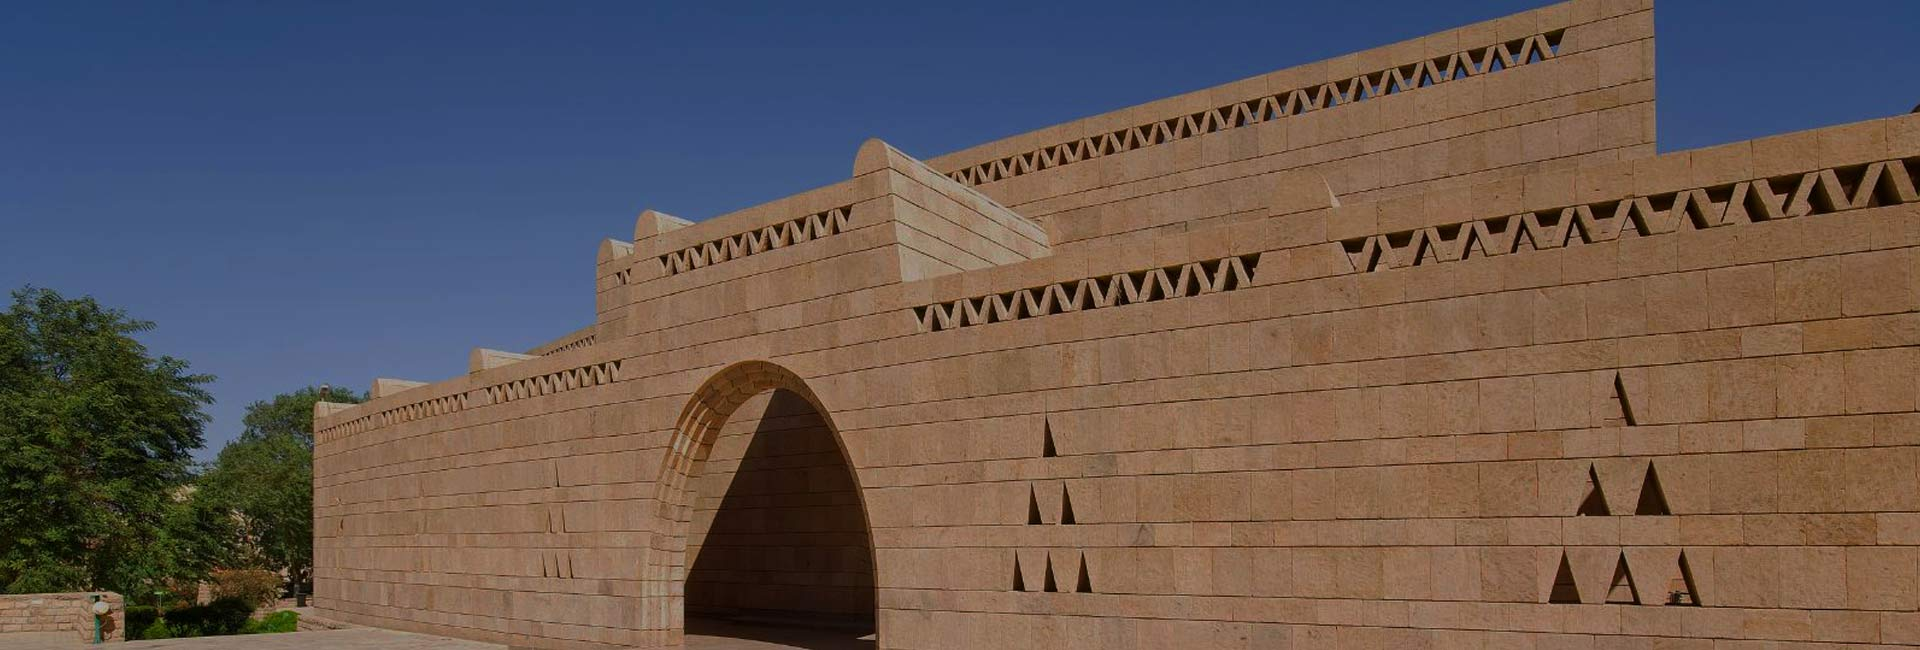 Tour To Nubian Museum In Aswan